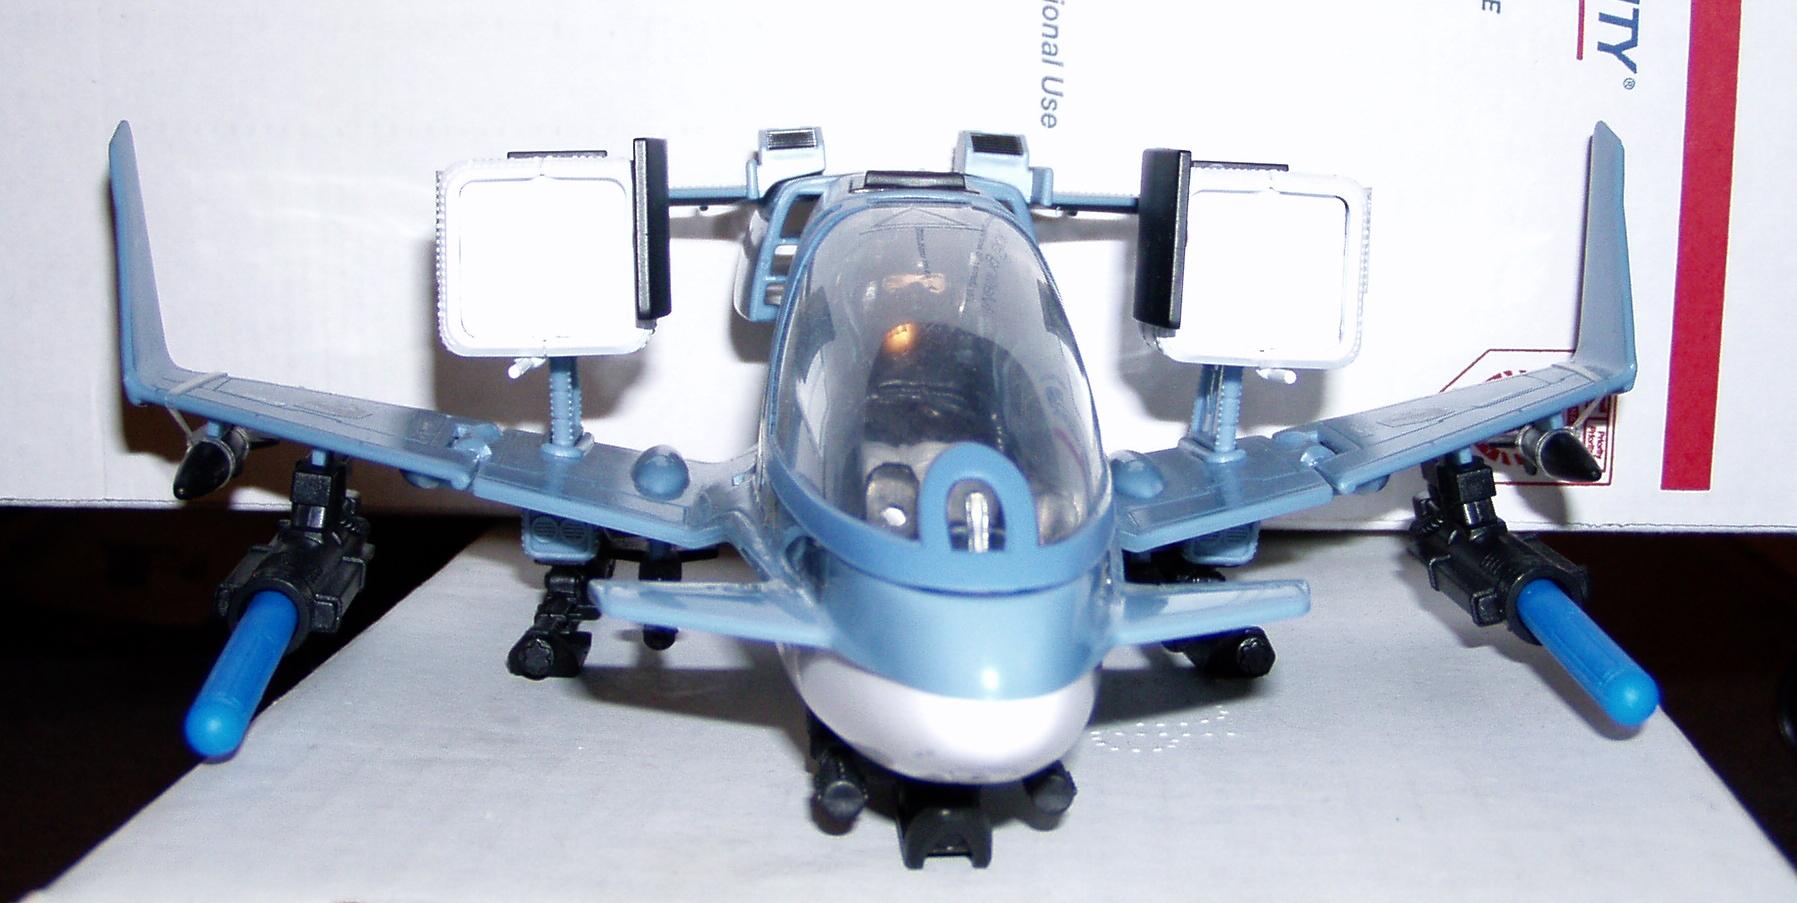 GI Joe Vehicle ROC SKY SWEEPER JET Missile Launcher 2009 Original Part